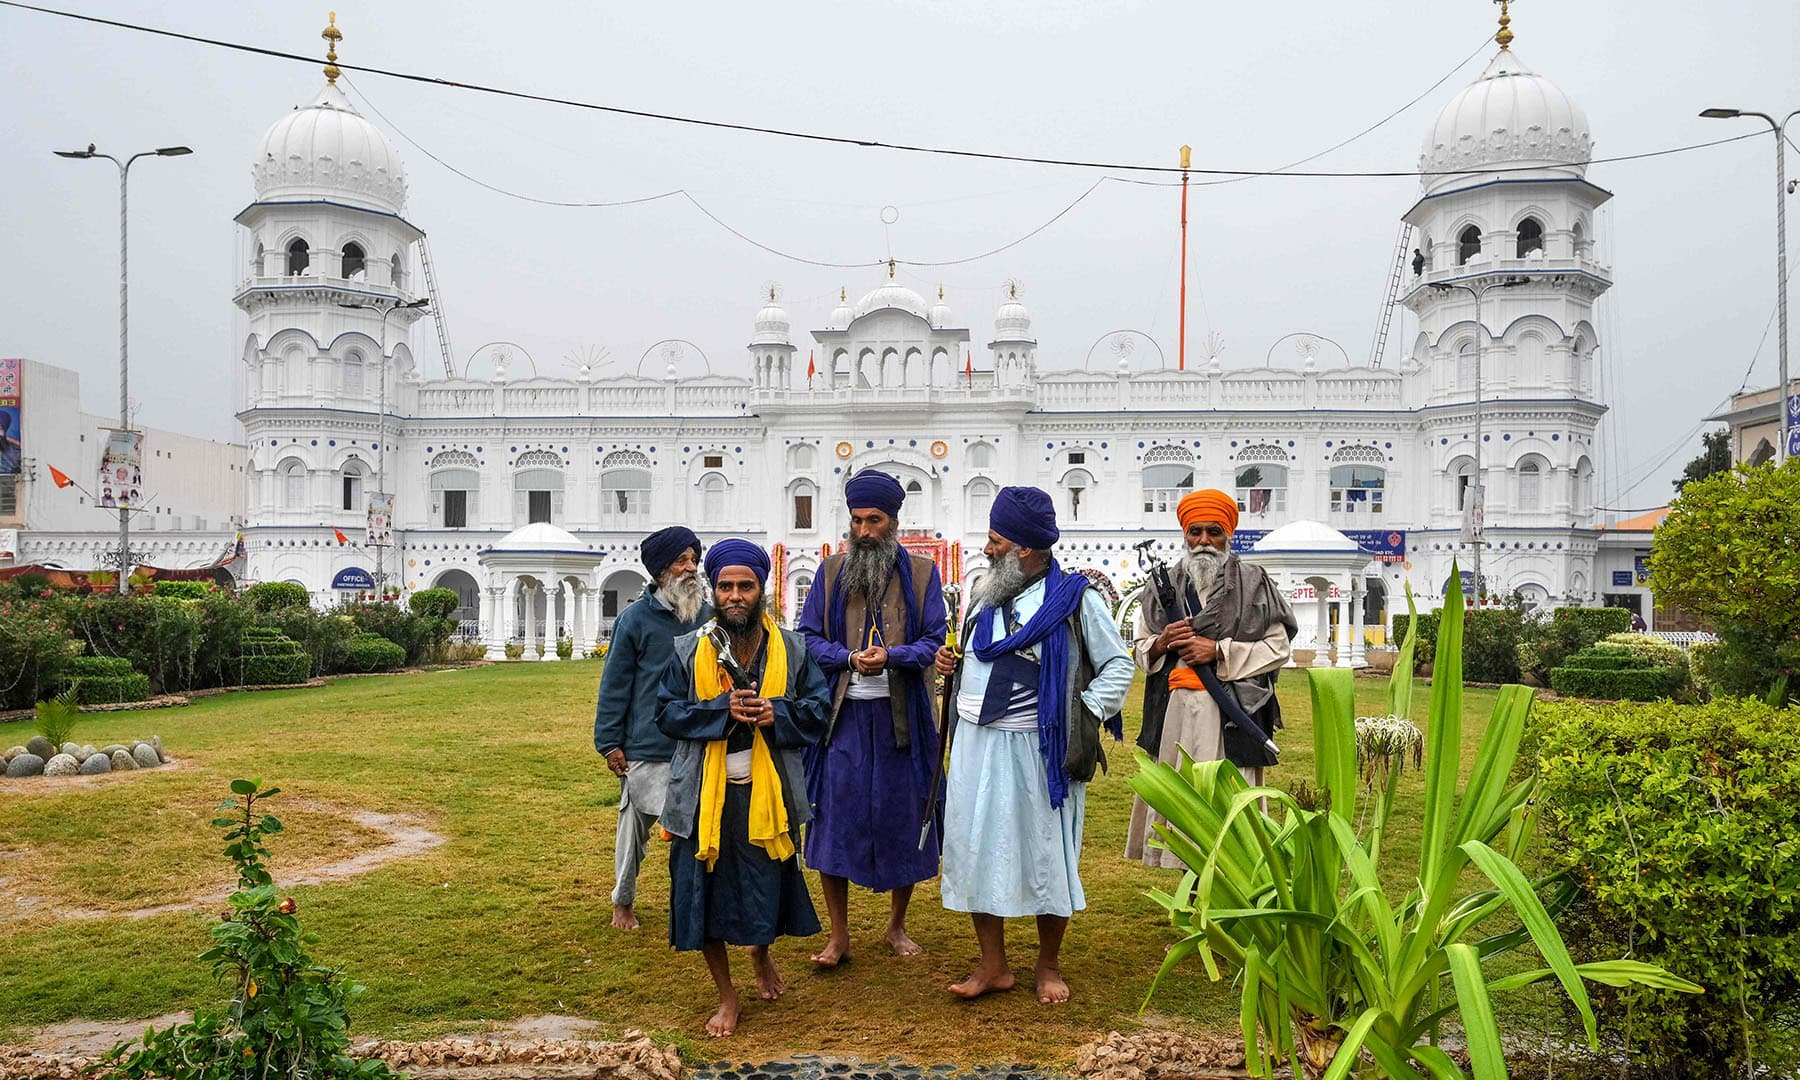 Sikh pilgrims visit the shrine in Nankana Sahib, some 75 km west of Lahore, on November 7. — AFP